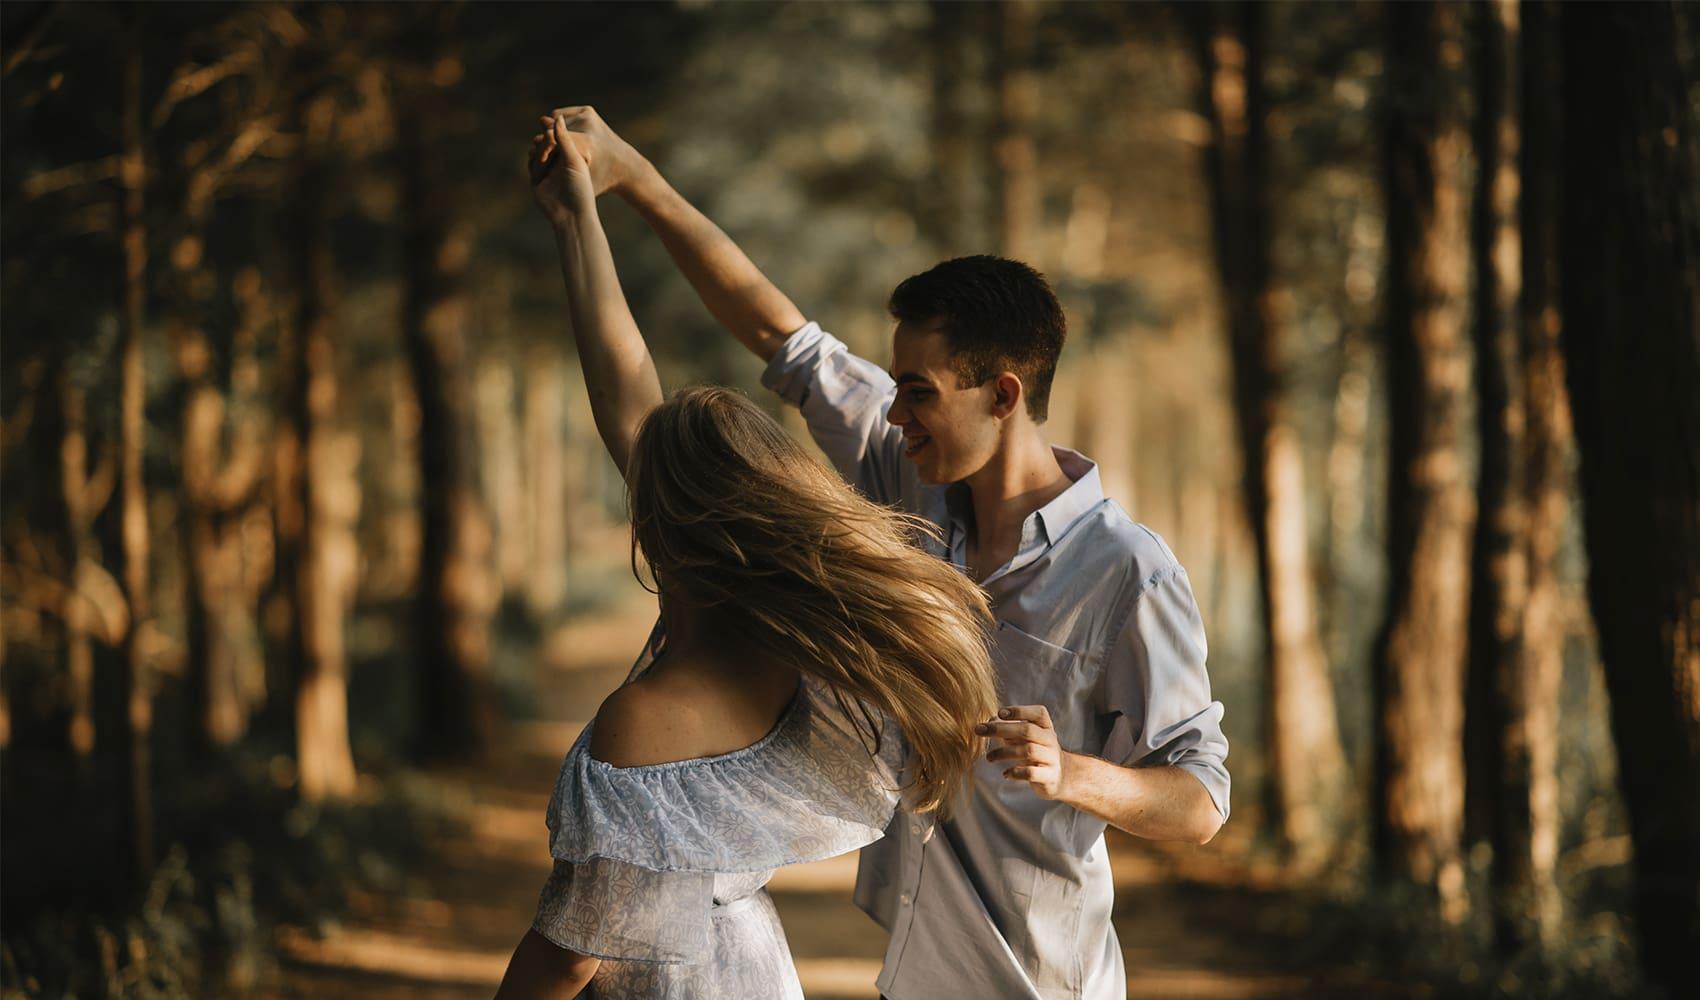 счастливая пара танцует